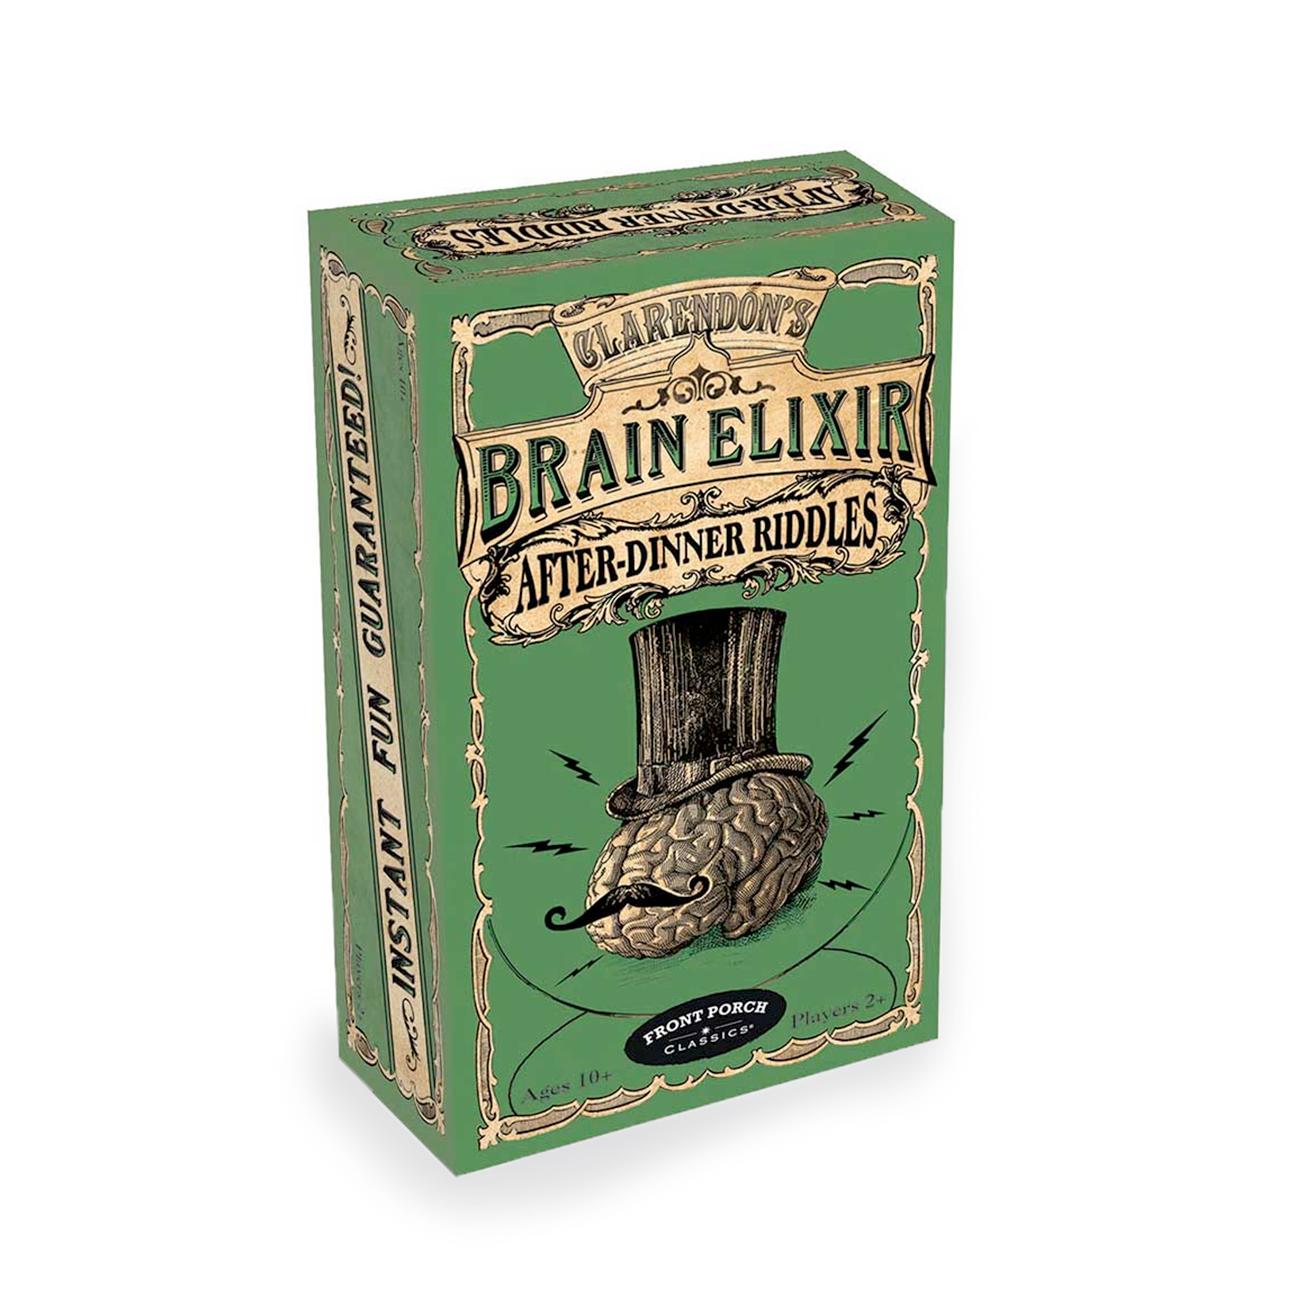 Clarendon's Brain Elixer-1